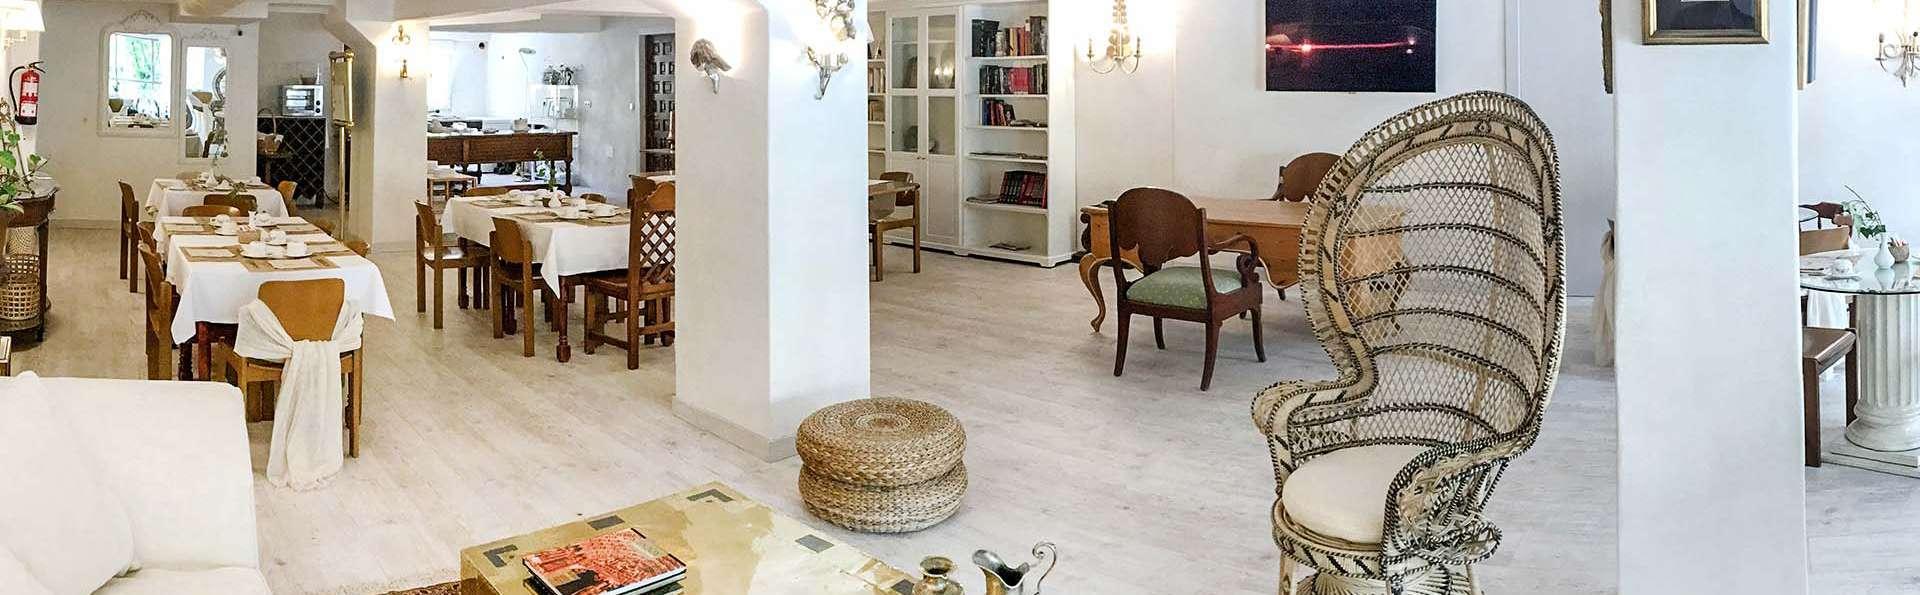 Hotel Maria Luisa - EDIT_SALON_MIMBRE_PANO_01.jpg